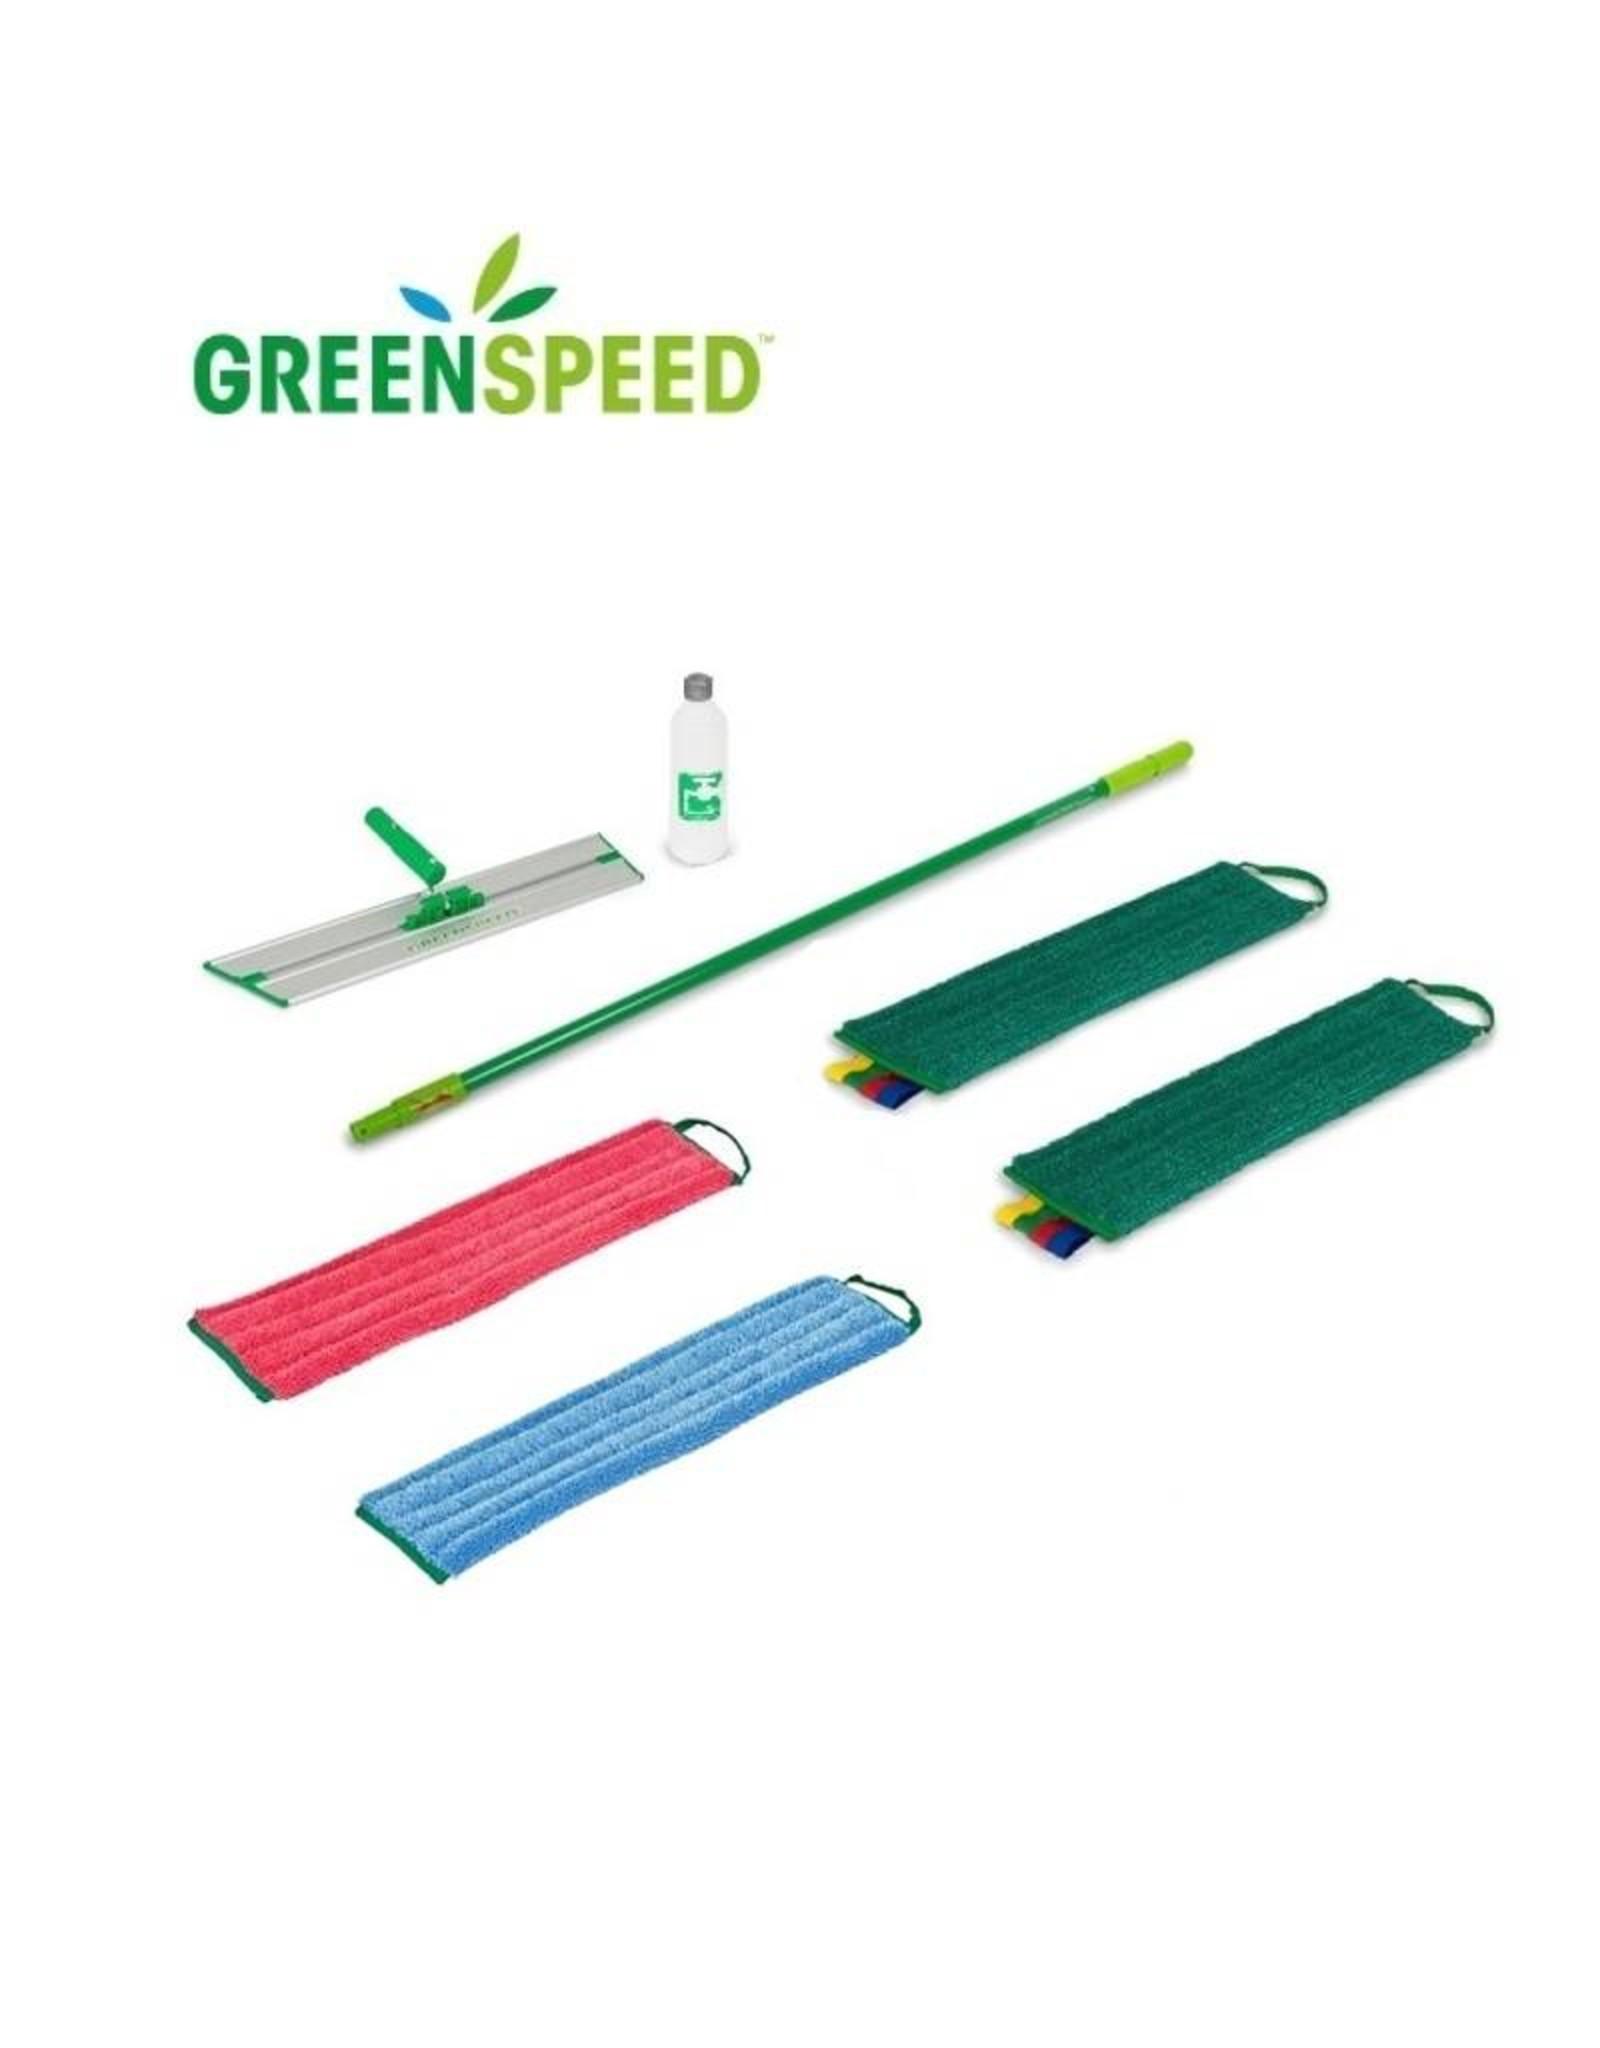 Greenspeed Greenspeed vlakmopset met 3 kleuren vlakmoppen